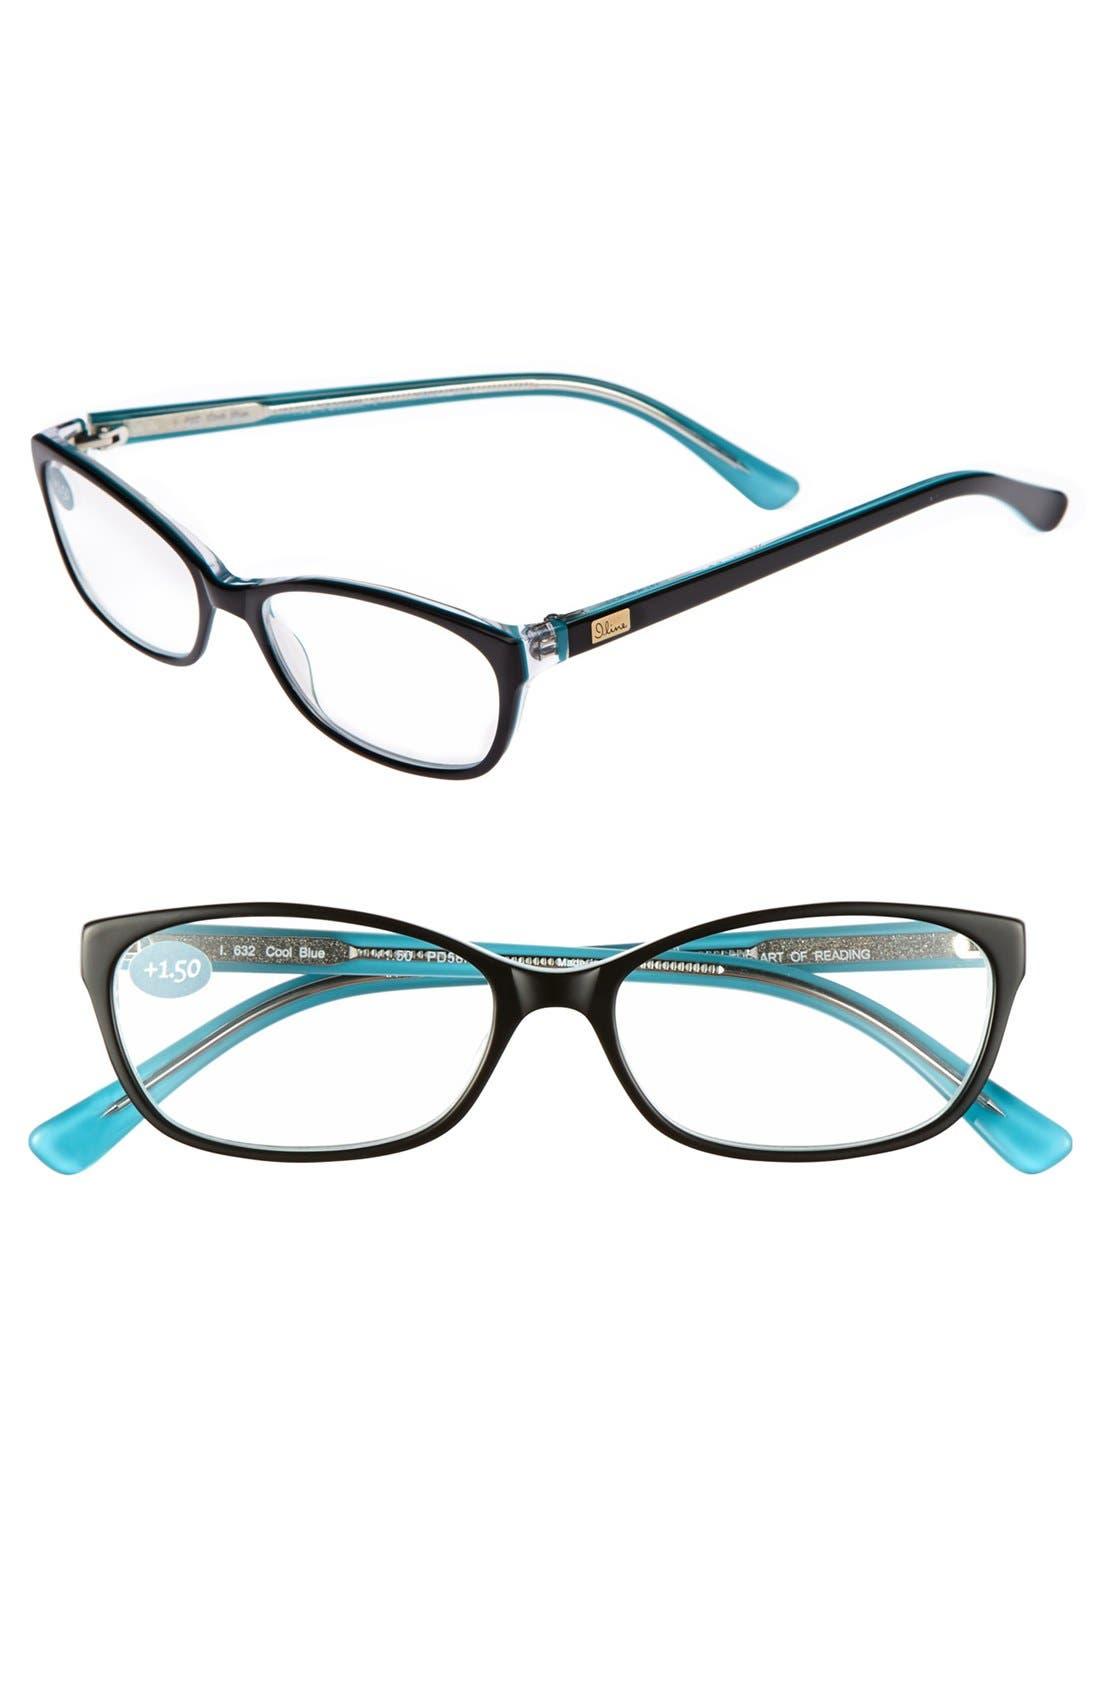 Alternate Image 1 Selected - I Line Eyewear 'Cool Blue' 53mm Reading Glasses